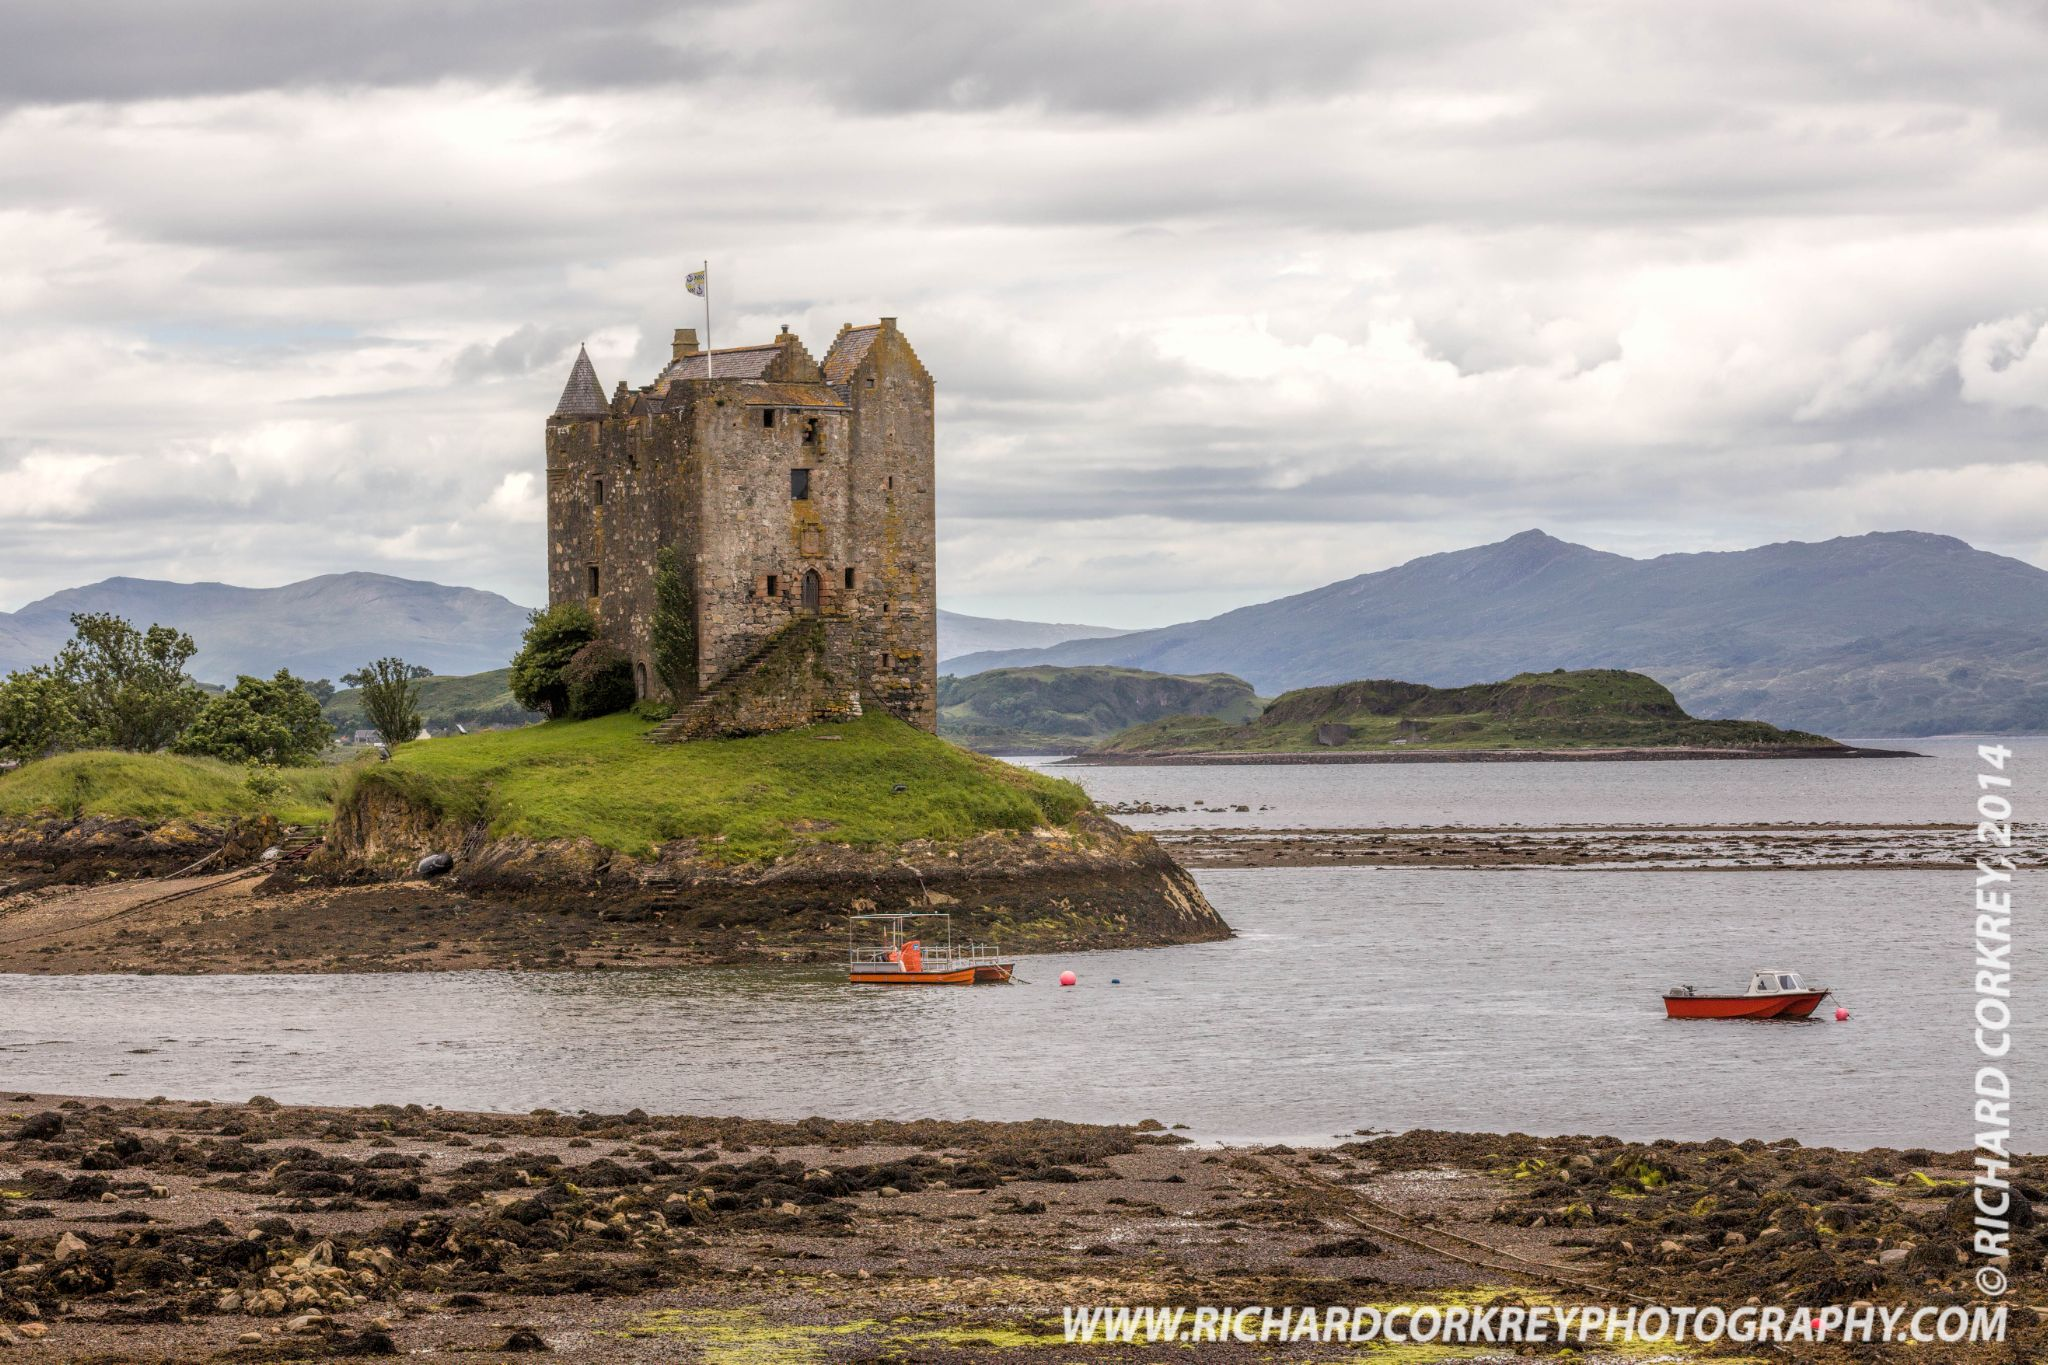 Castle Stalker from Portnacroish by Richard Corkrey